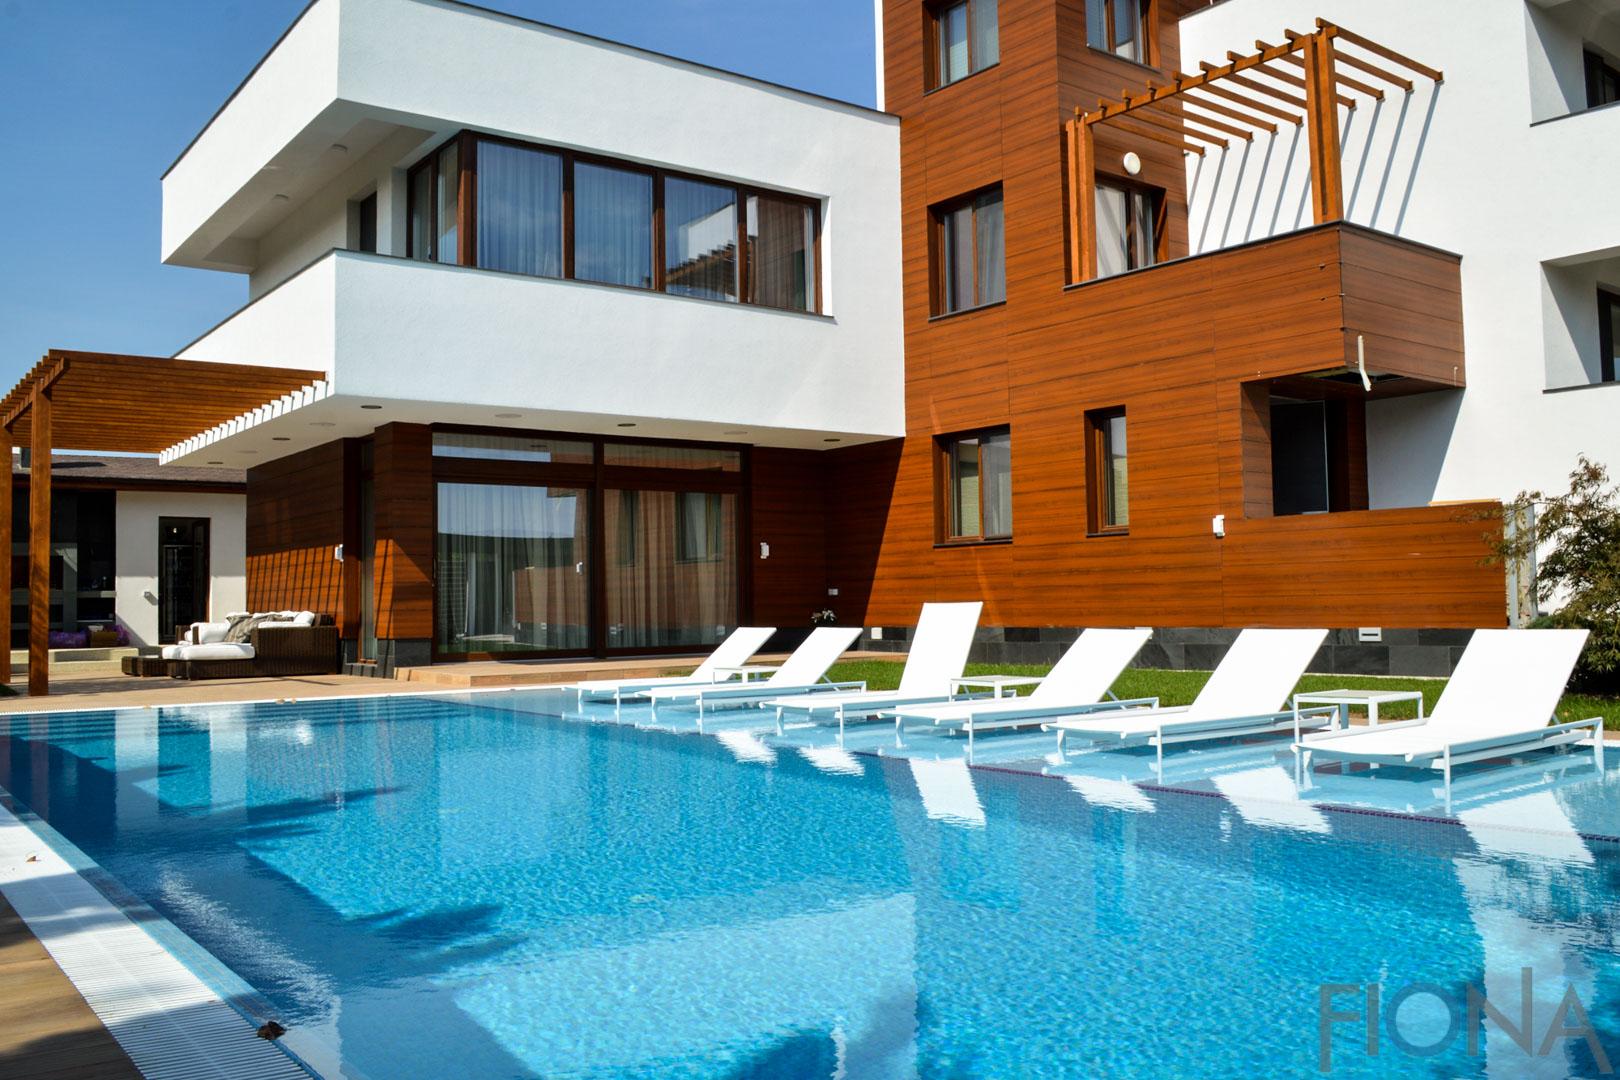 piscina-privata-overflow7